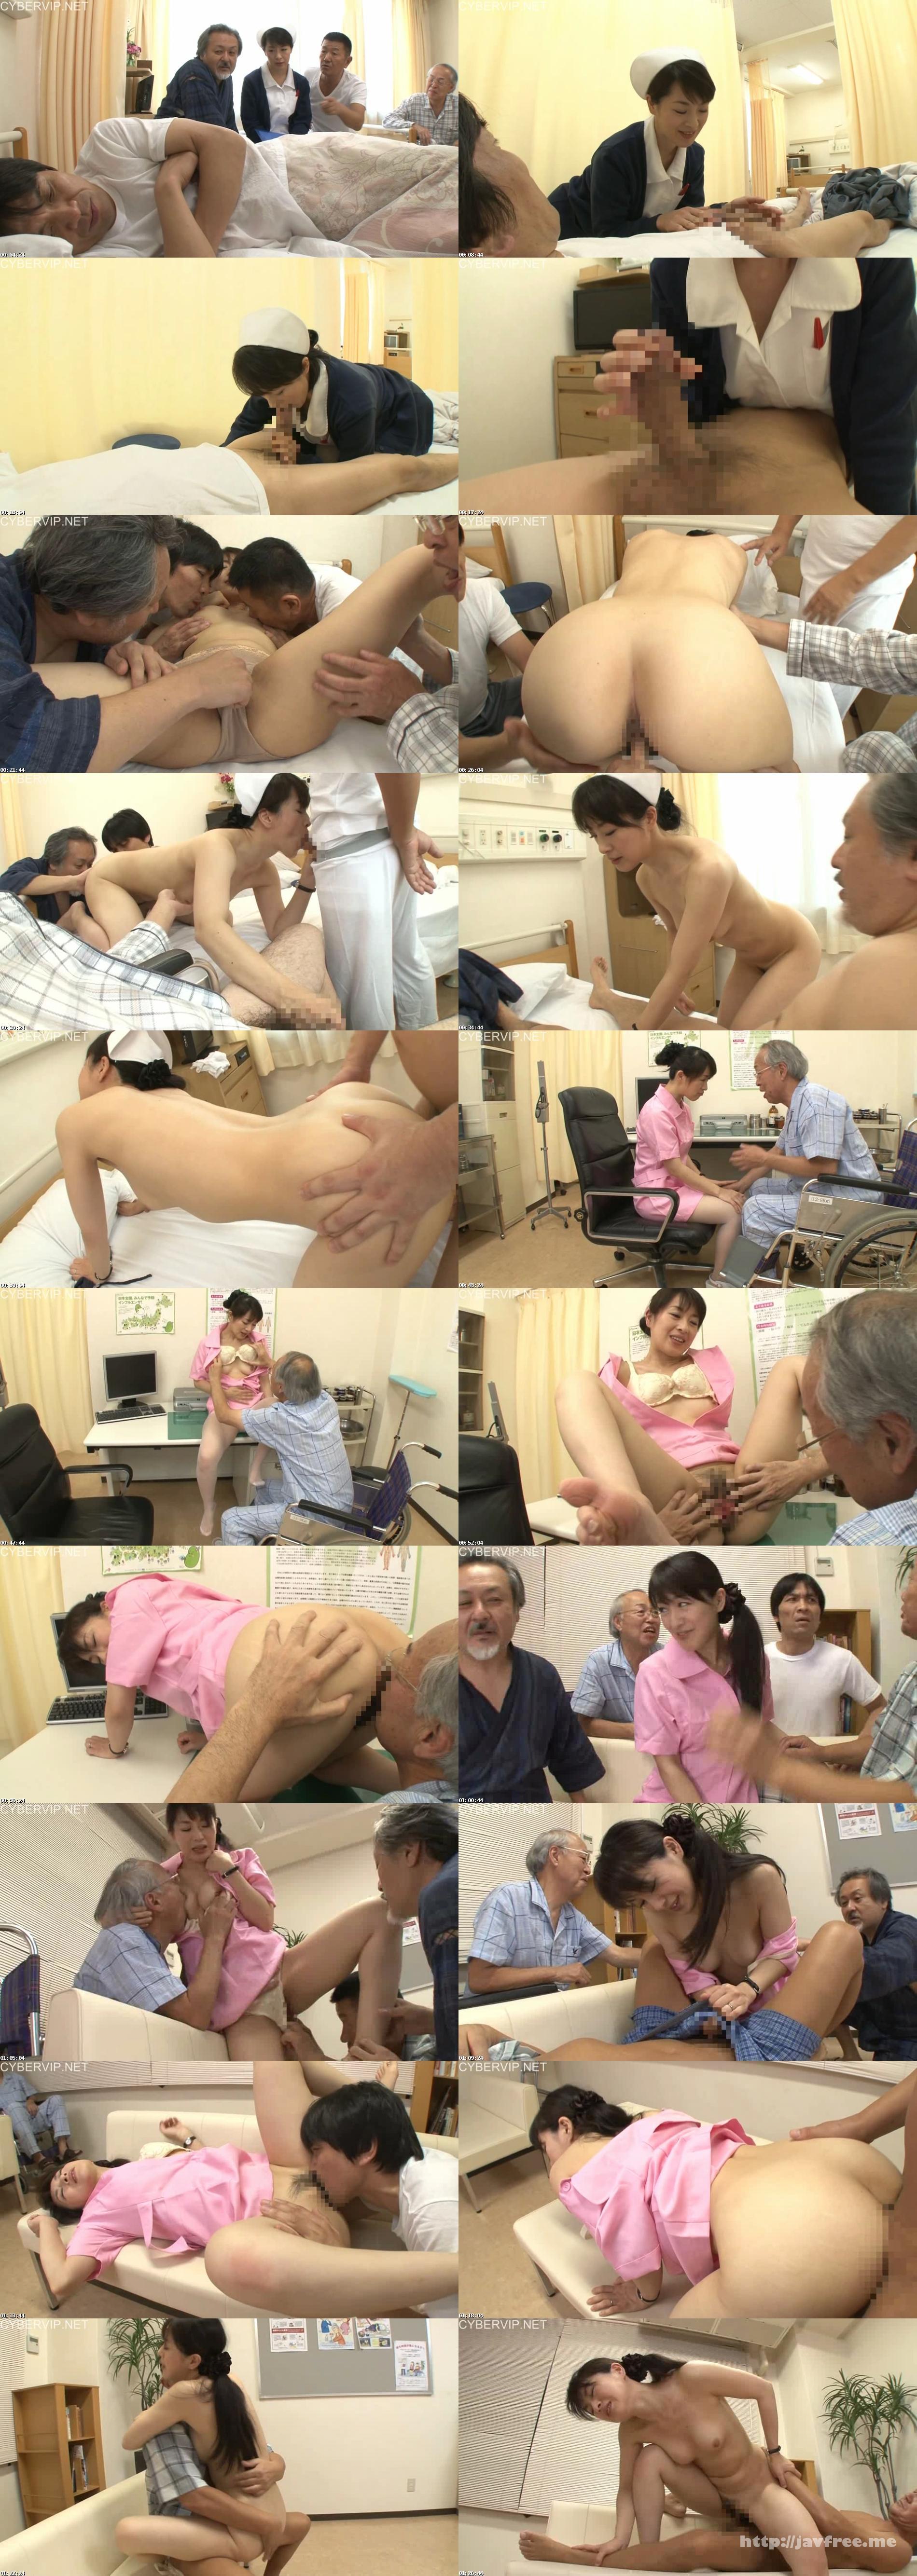 [MESU-26] 麗しのナース母 わびしい中年病棟のやさしい性処理天使 篠宮千明 - image MESU-26 on https://javfree.me